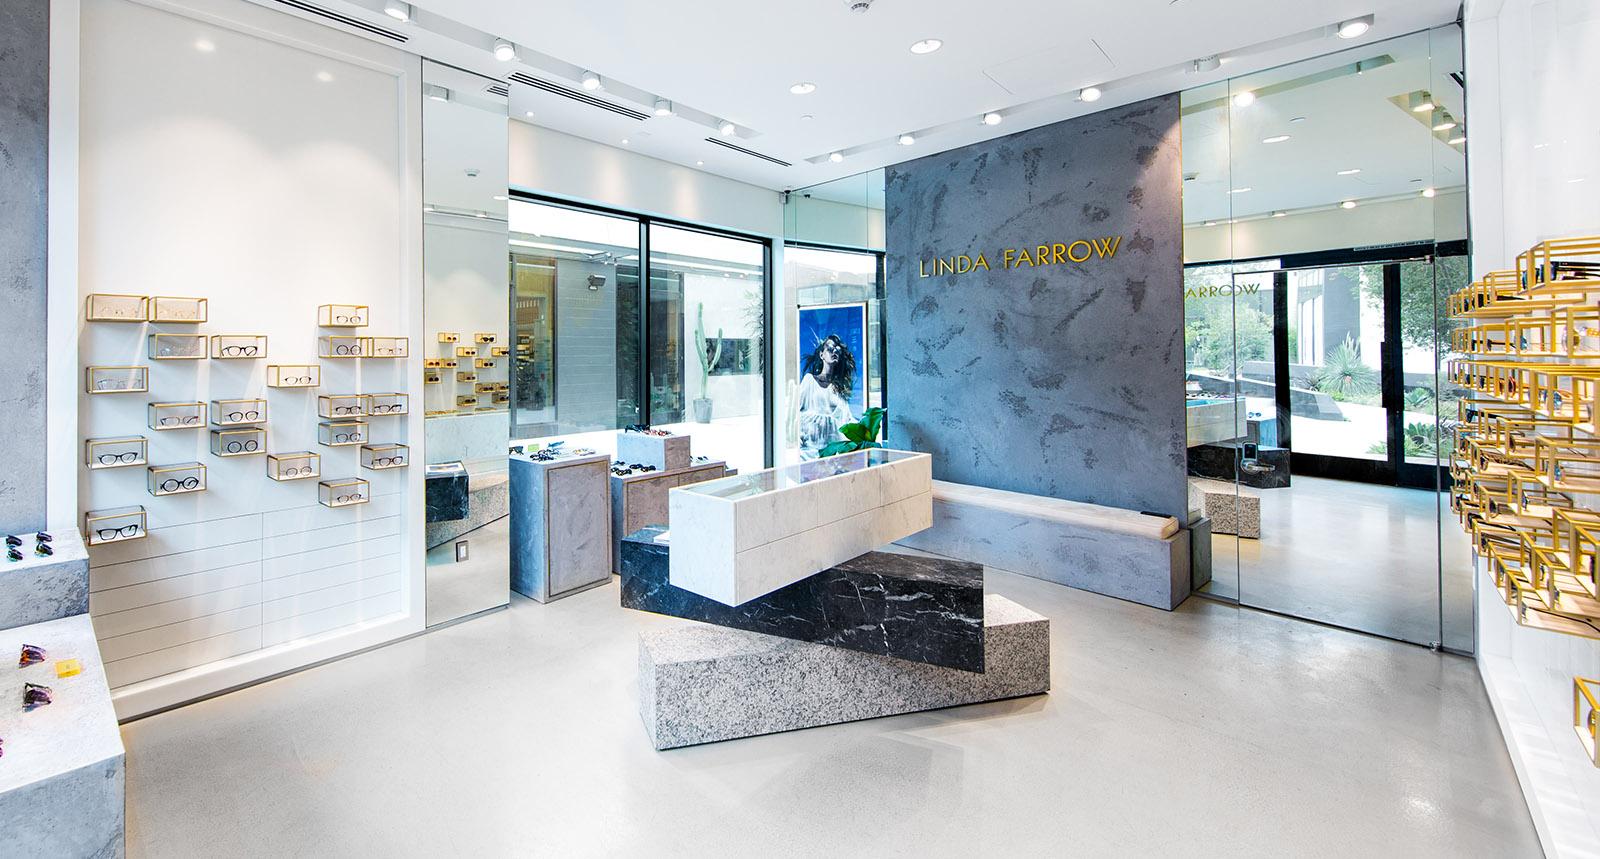 Store Interior View Alternative Angle